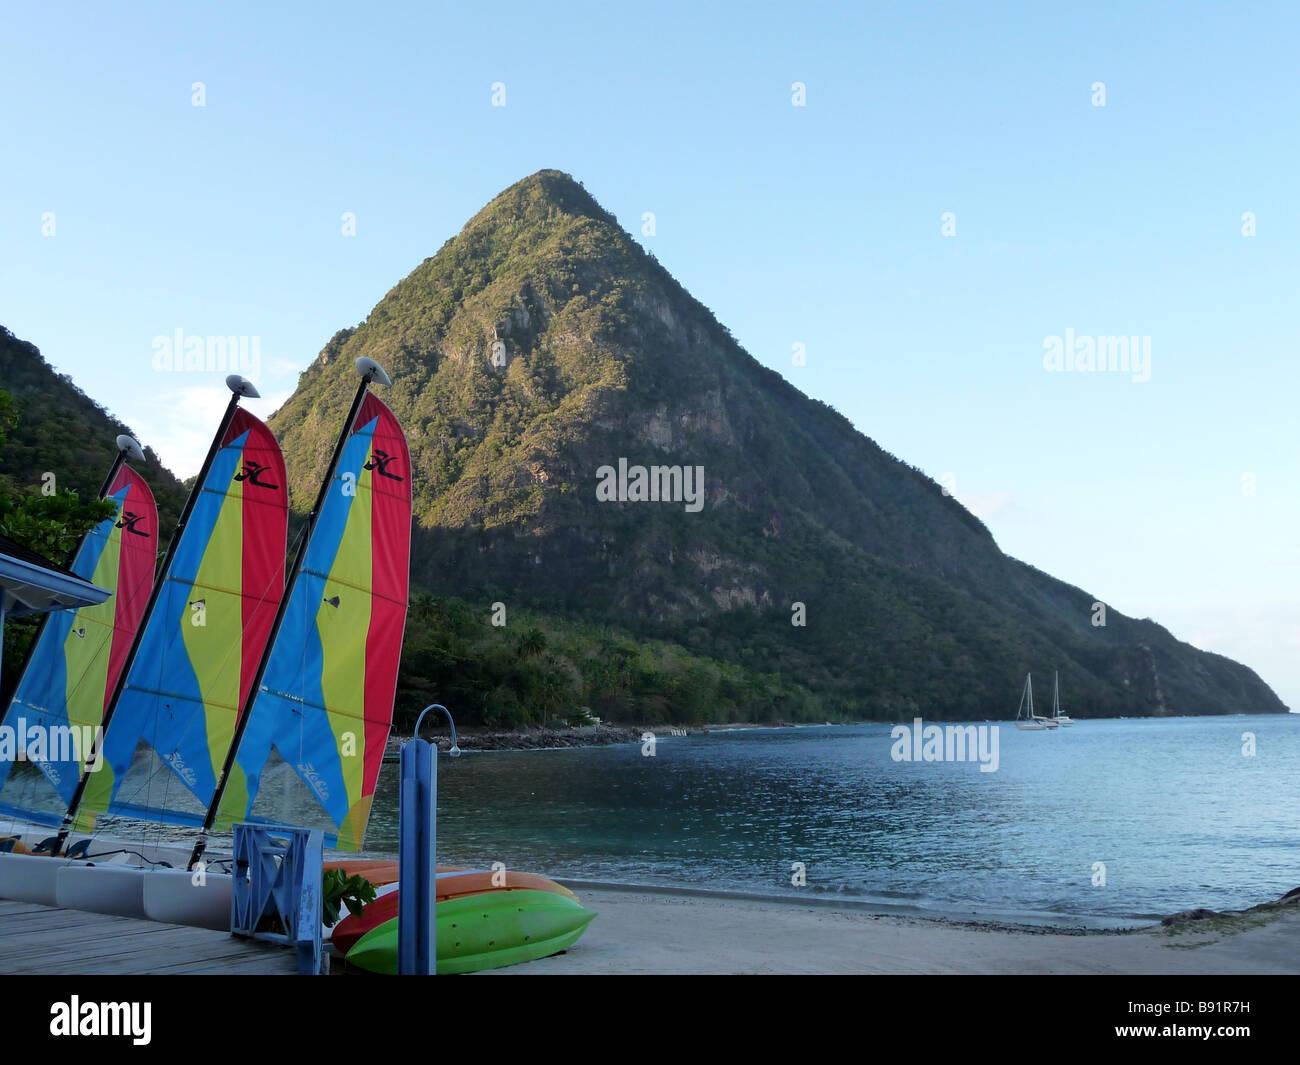 Gros Piton St Lucia - Stock Image